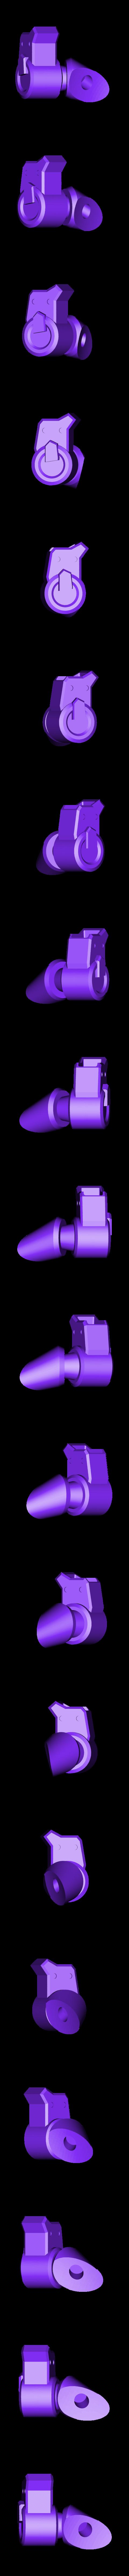 Thigh-RightBack.stl Download STL file Hammond's Wrecking Ball Mech from Overwatch • 3D printer template, FunbieStudios